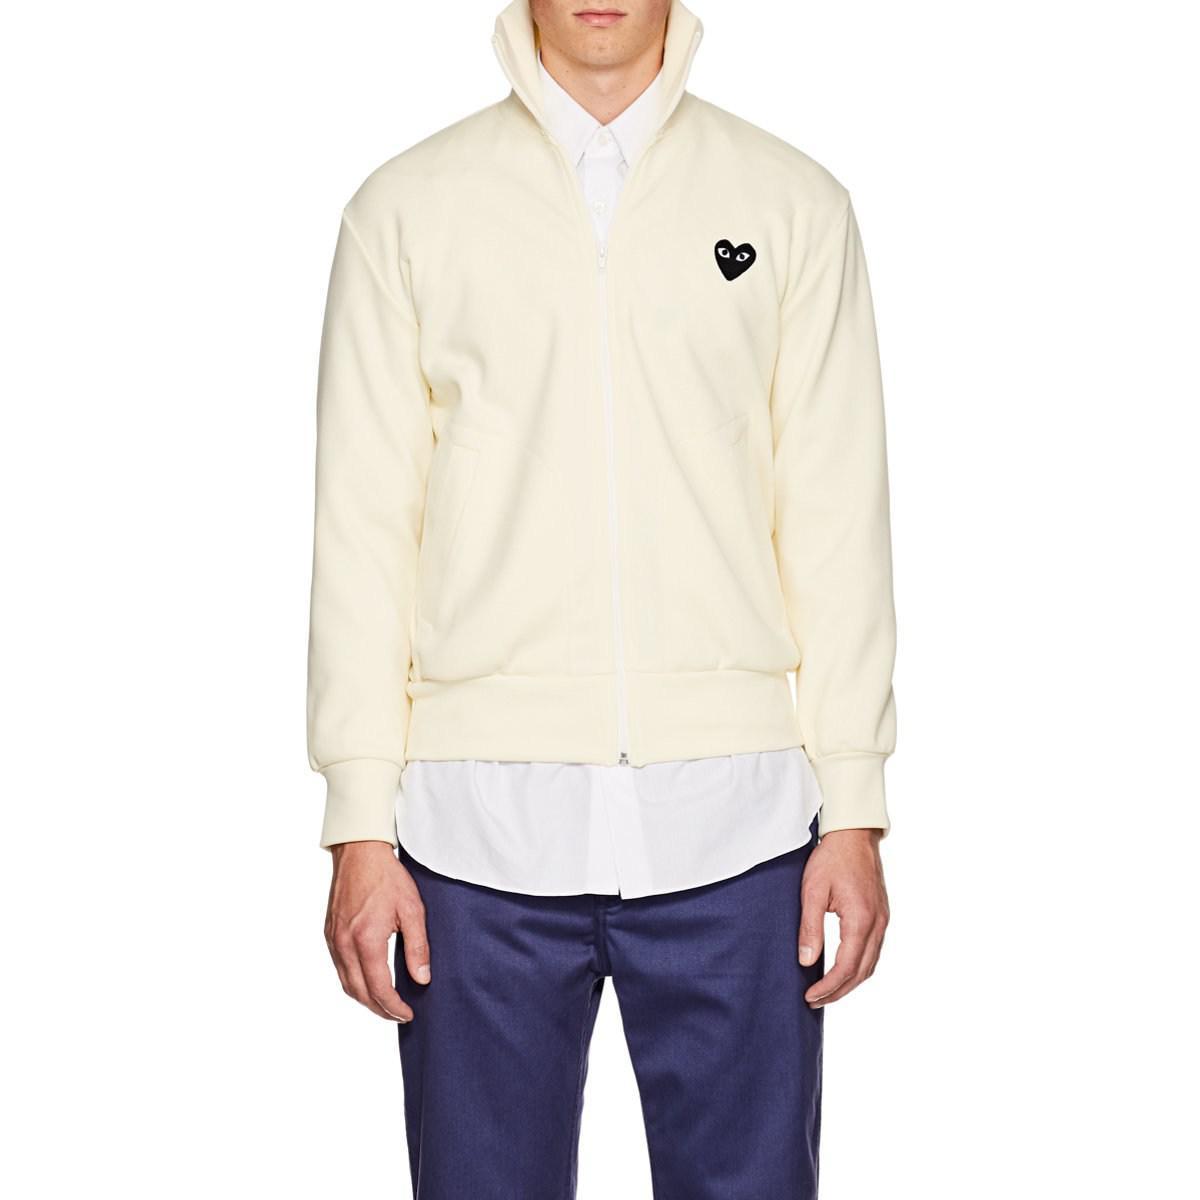 73fe17335 COMME DES GARÇONS PLAY Heart Track Jacket in White for Men - Lyst